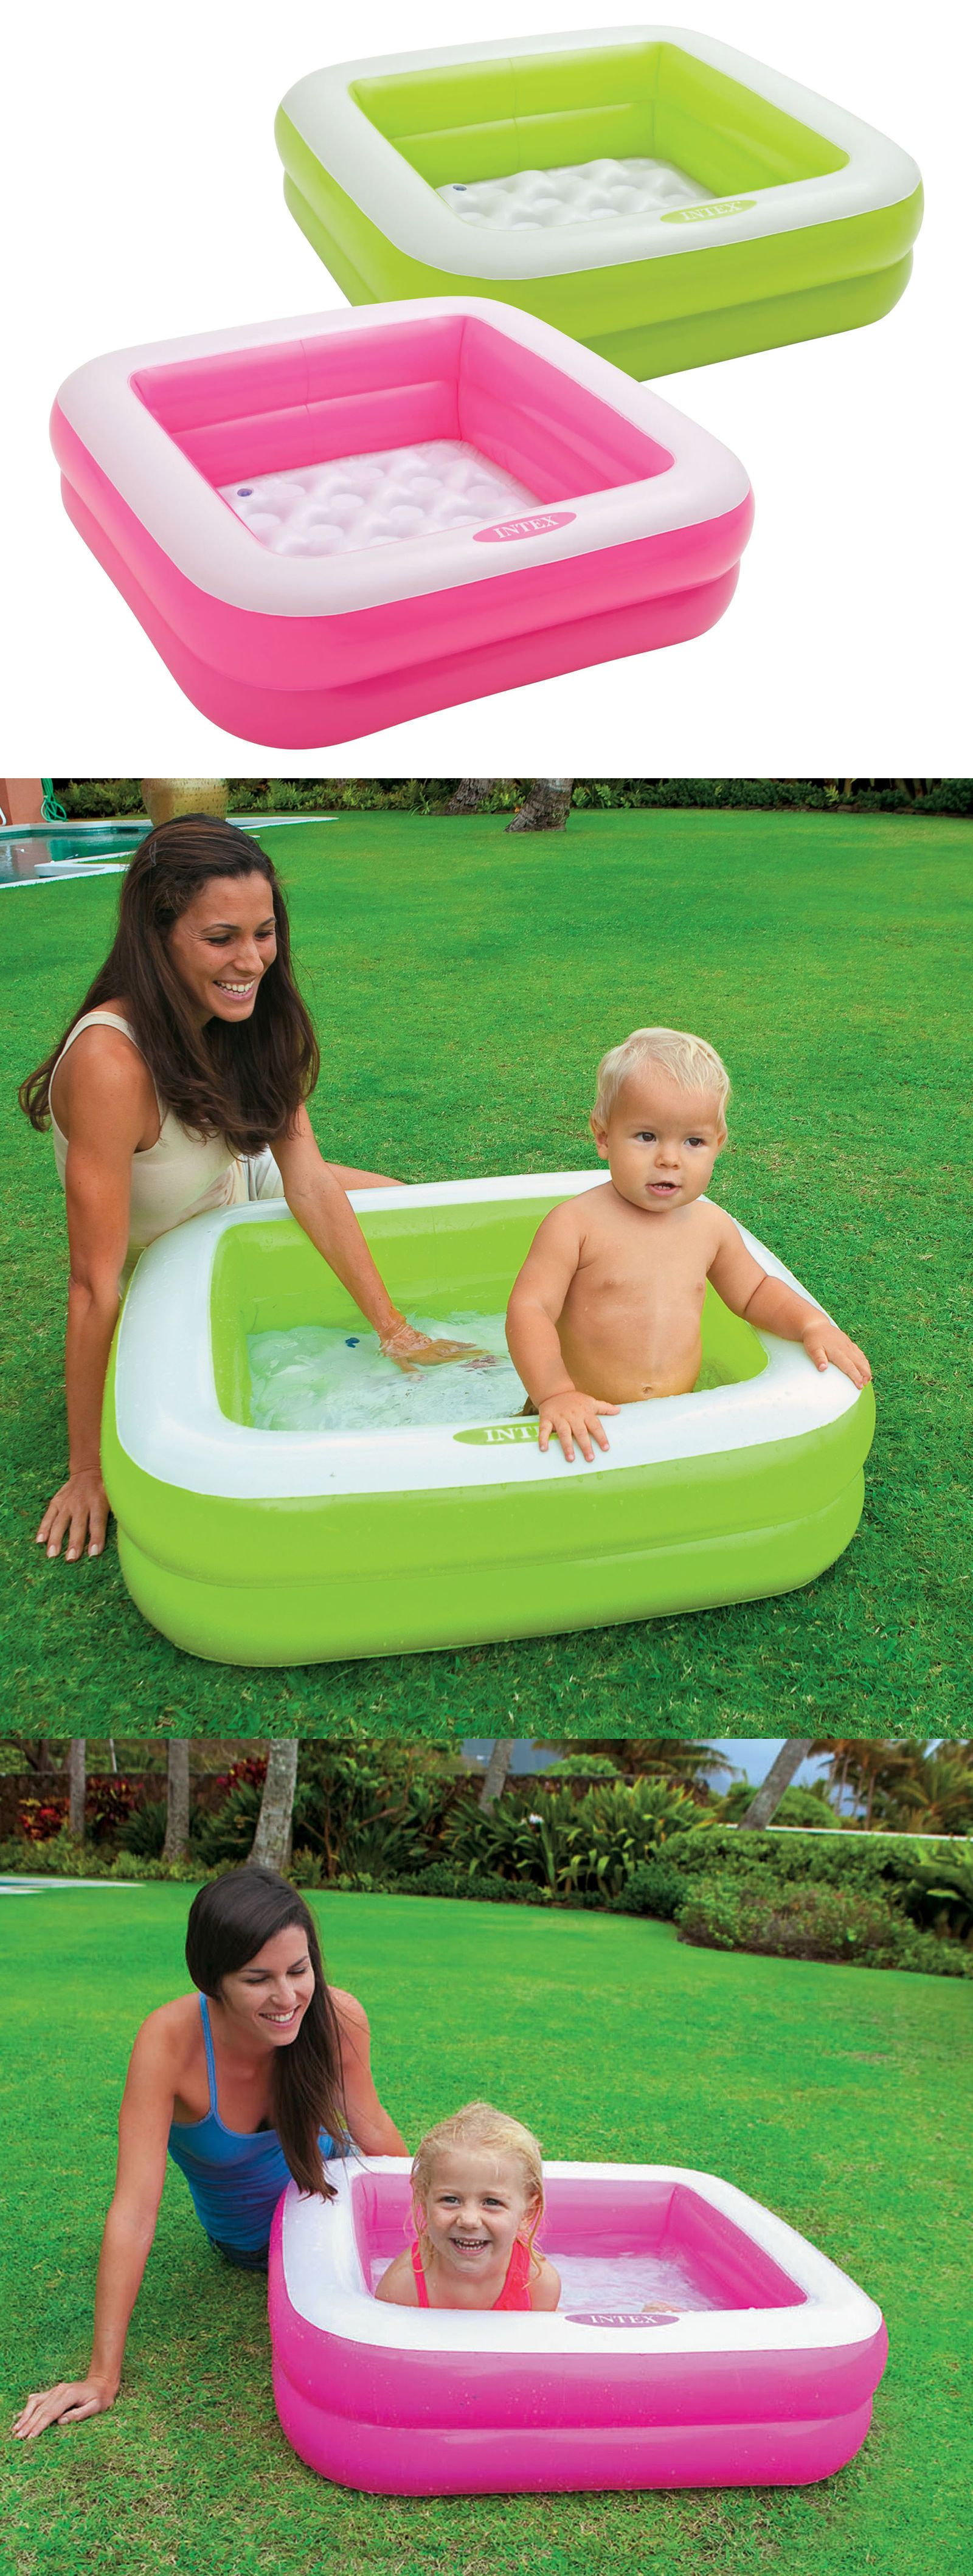 Inflatable and Kid Pools 116407 Intex Play Pool Baby